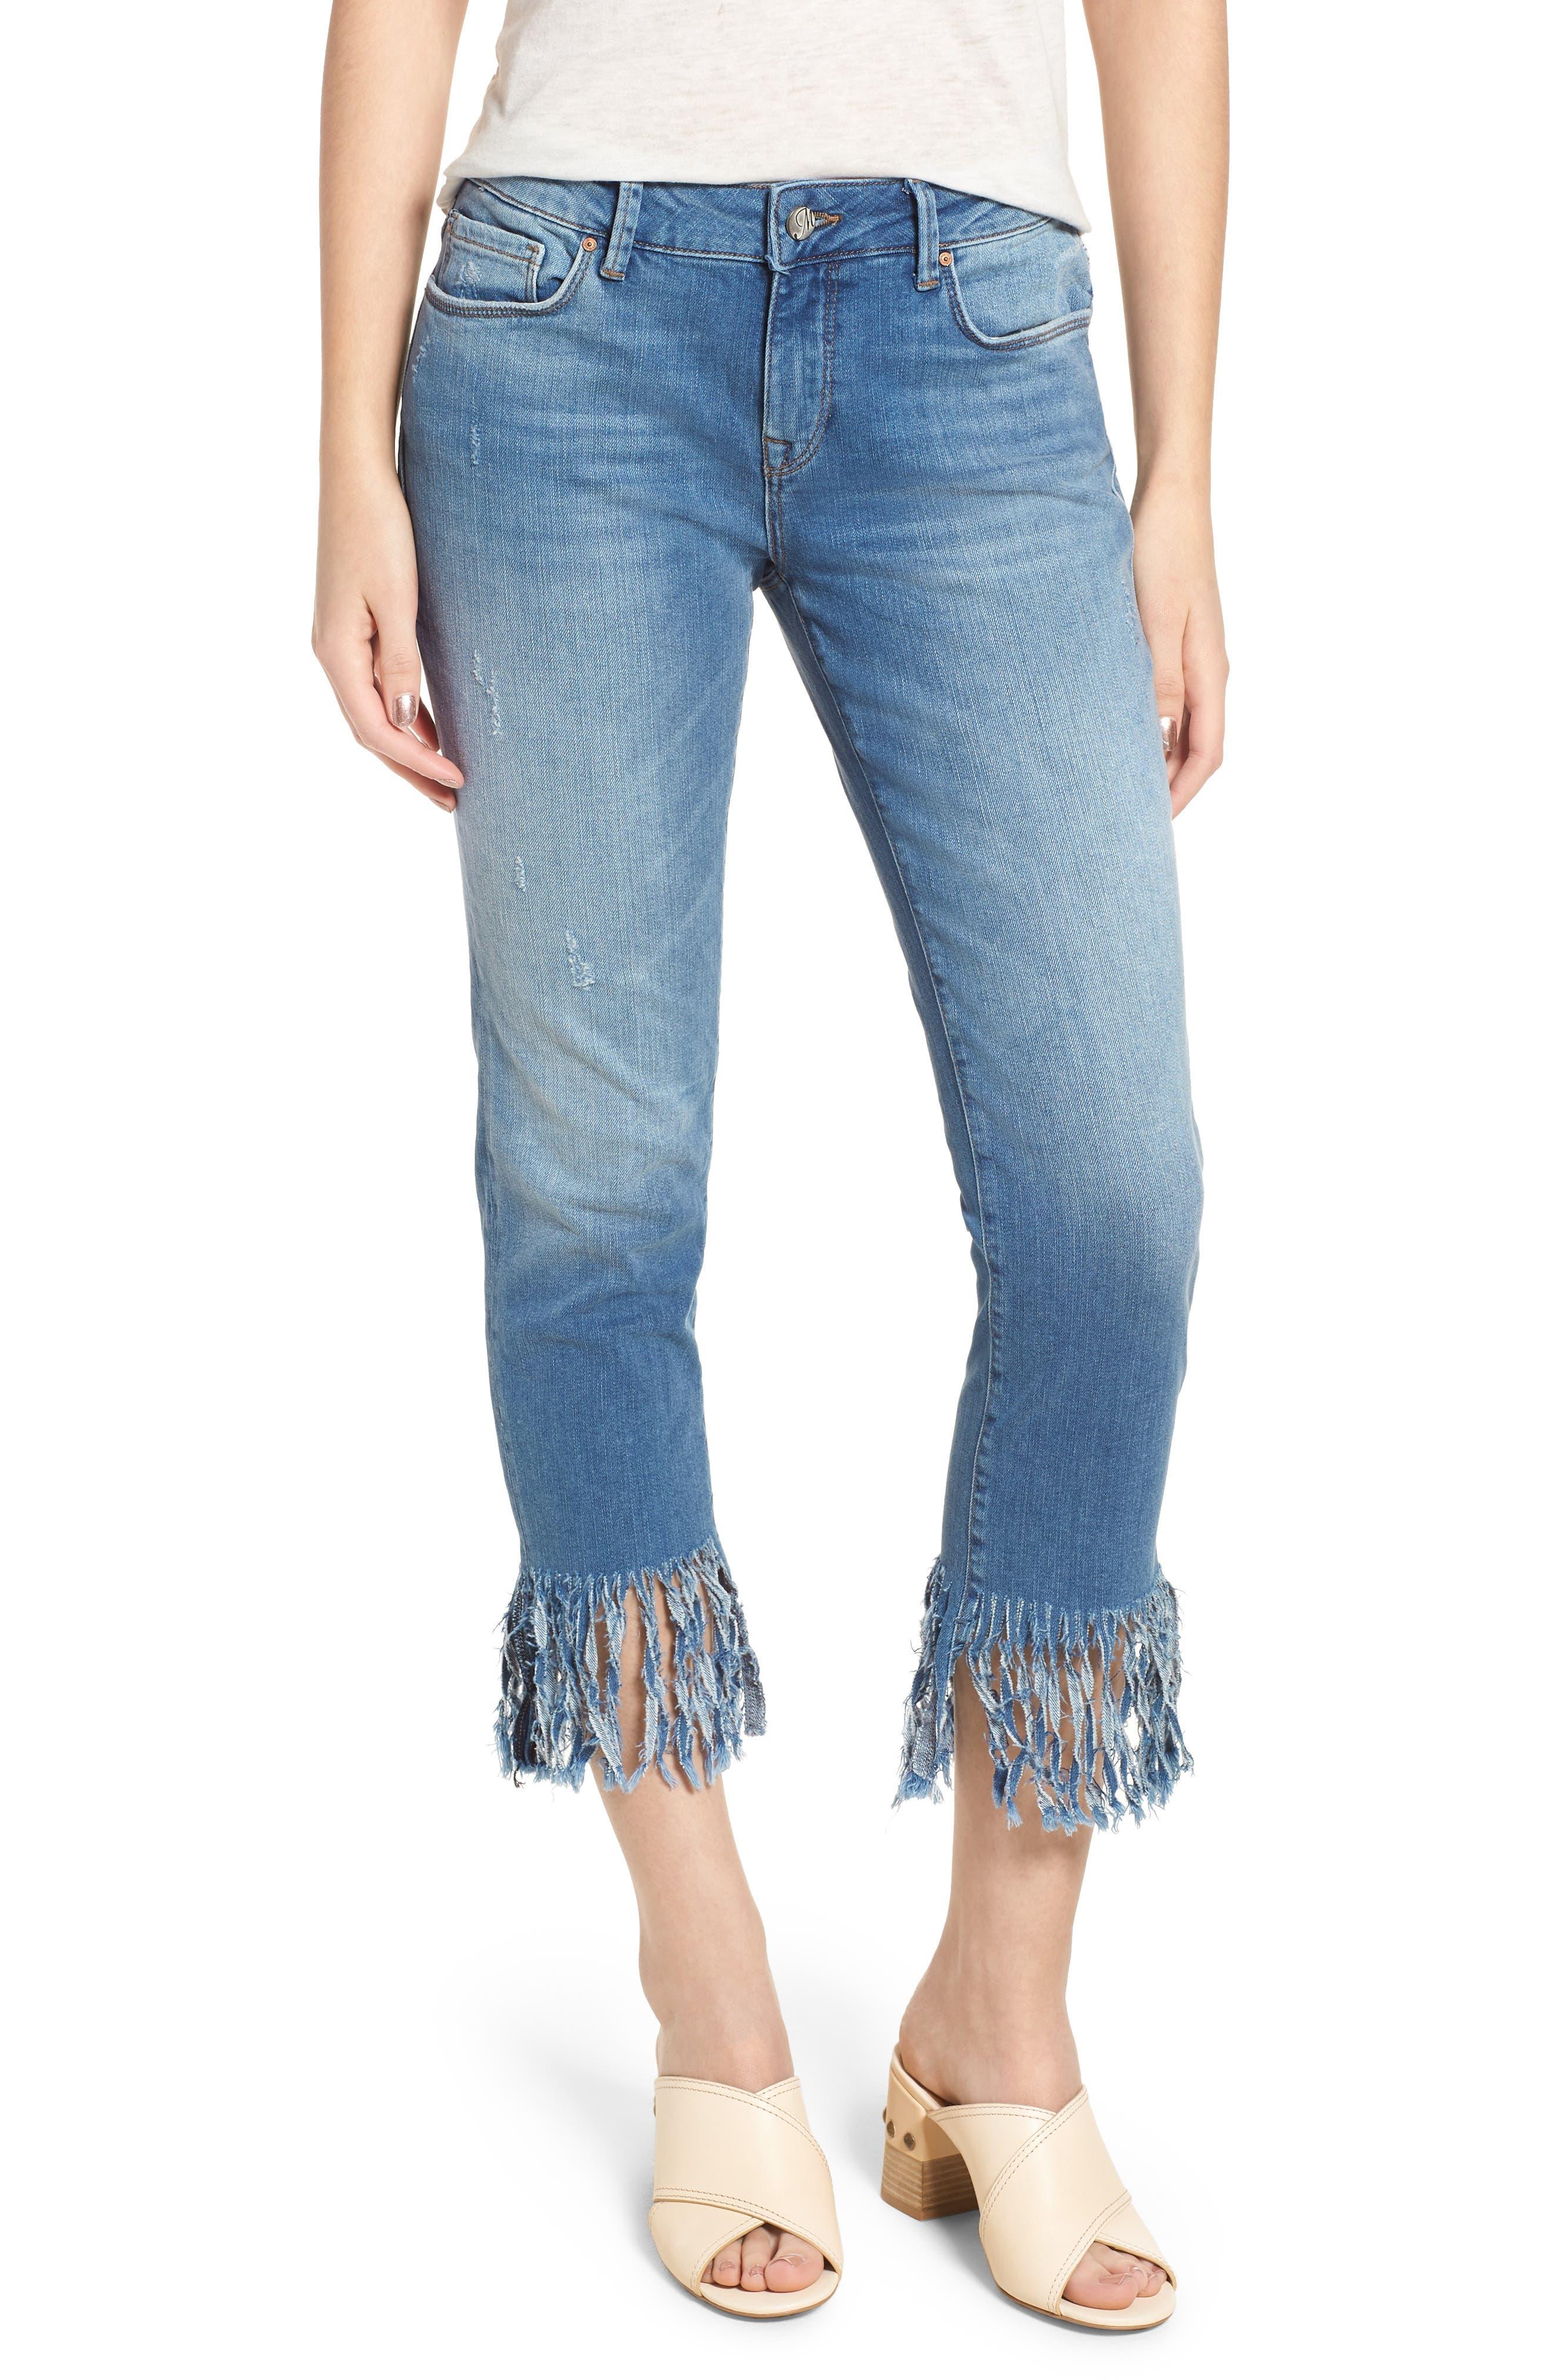 Mavi Jeans Kerry Fringe Hem Ankle Jeans (Distressed Vintage)